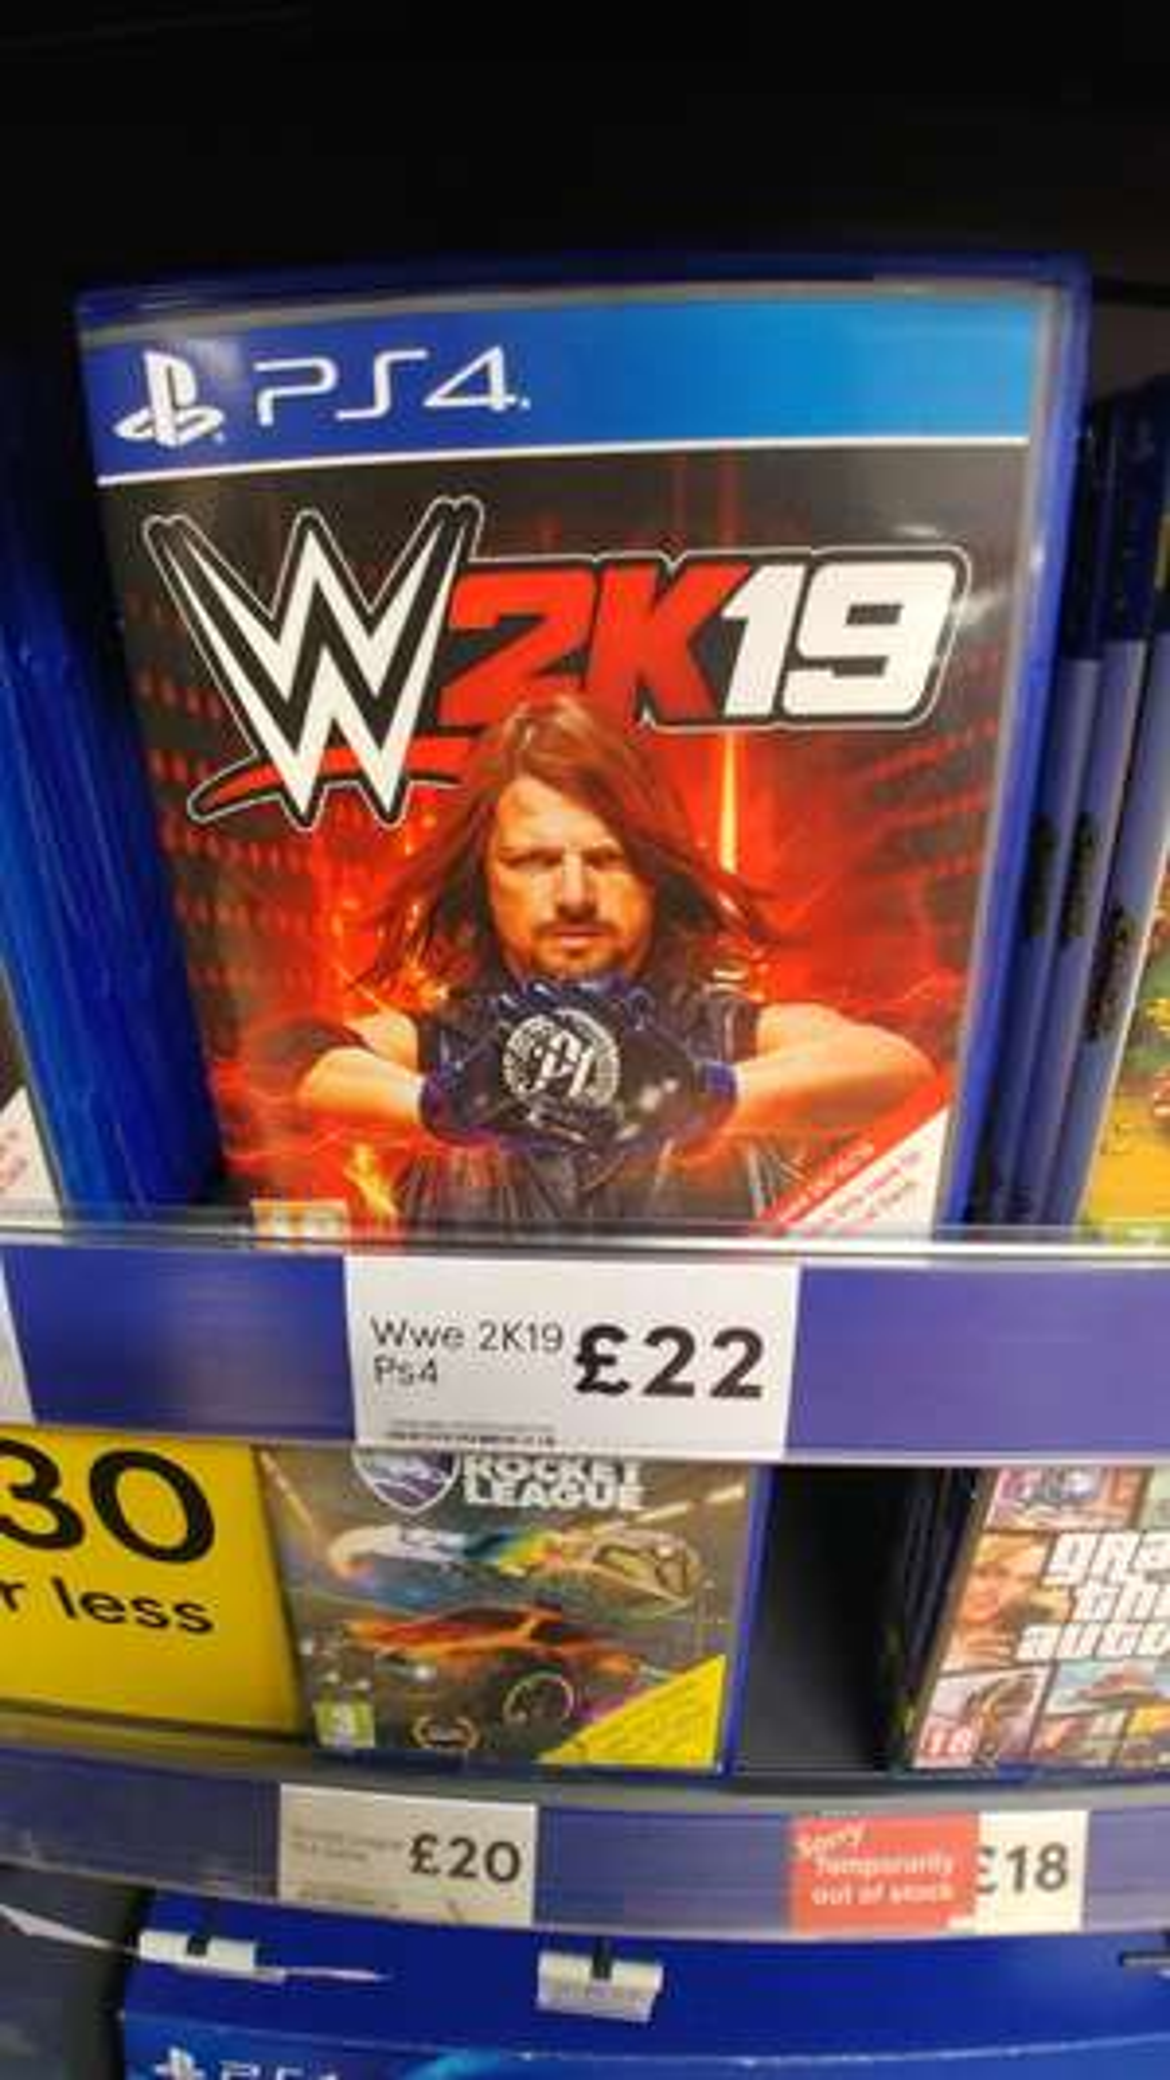 WWE 2K19 PS4 & XBox Tesco - £22 instore (Birmingham)